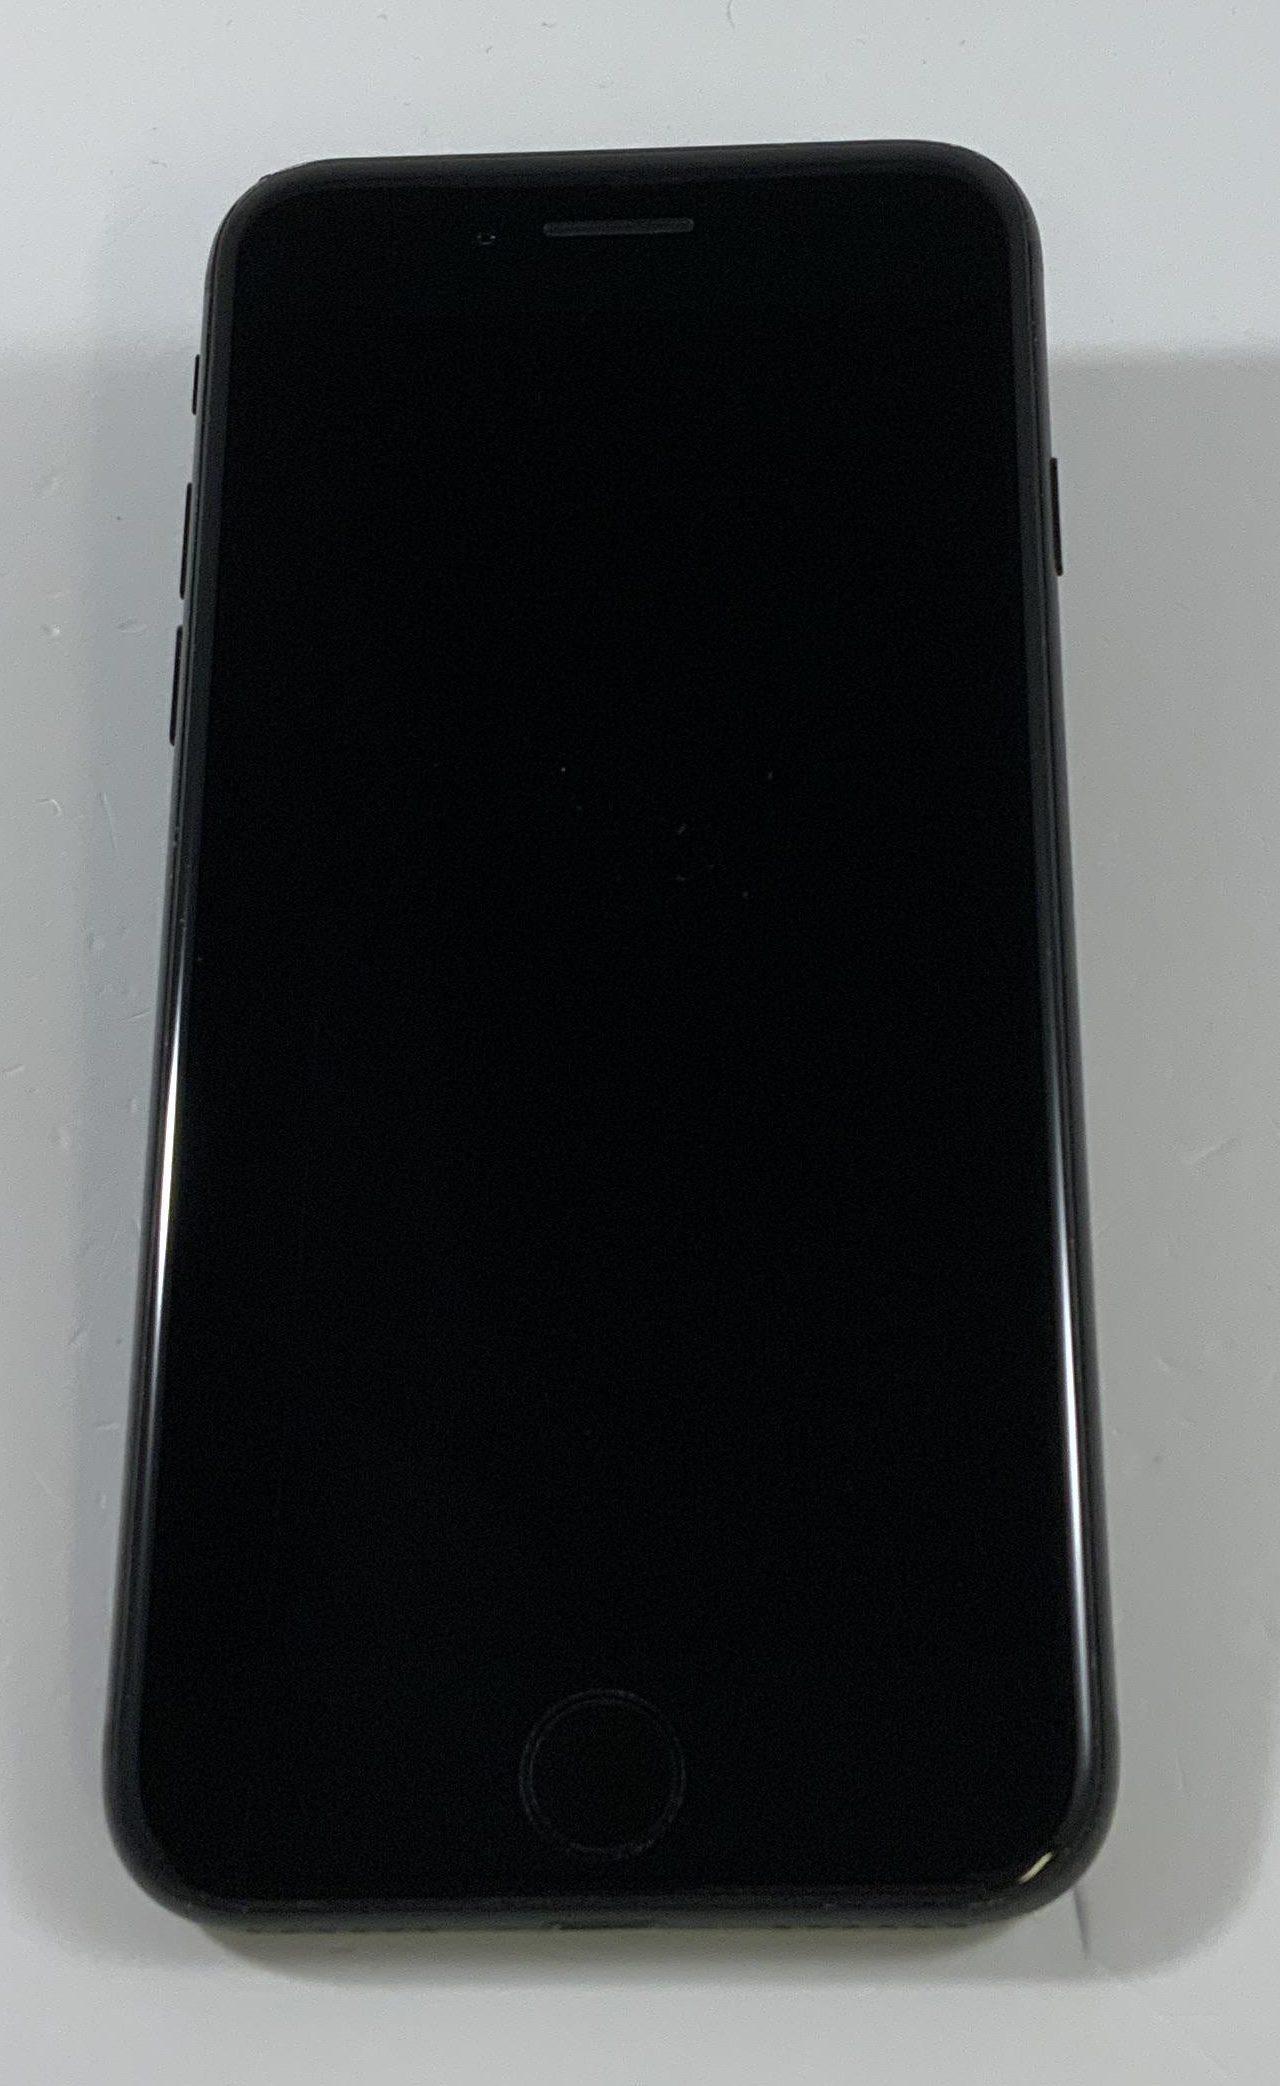 iPhone 7 32GB, 32GB, Black, immagine 1